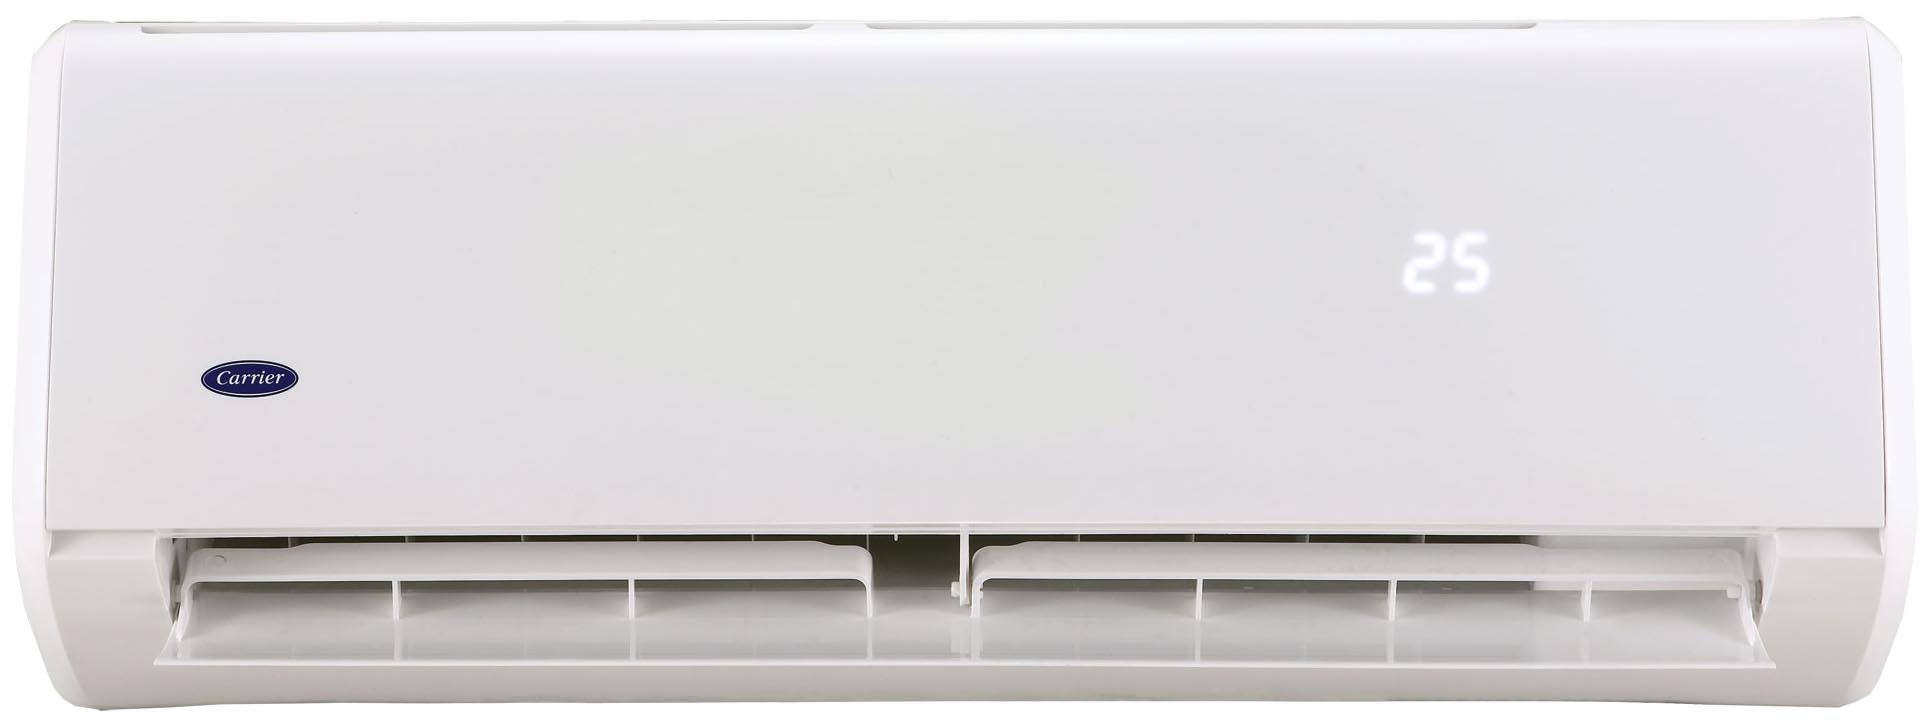 Carrier 42QHC018DS / 38QHC018DS серии Crystal Inverter